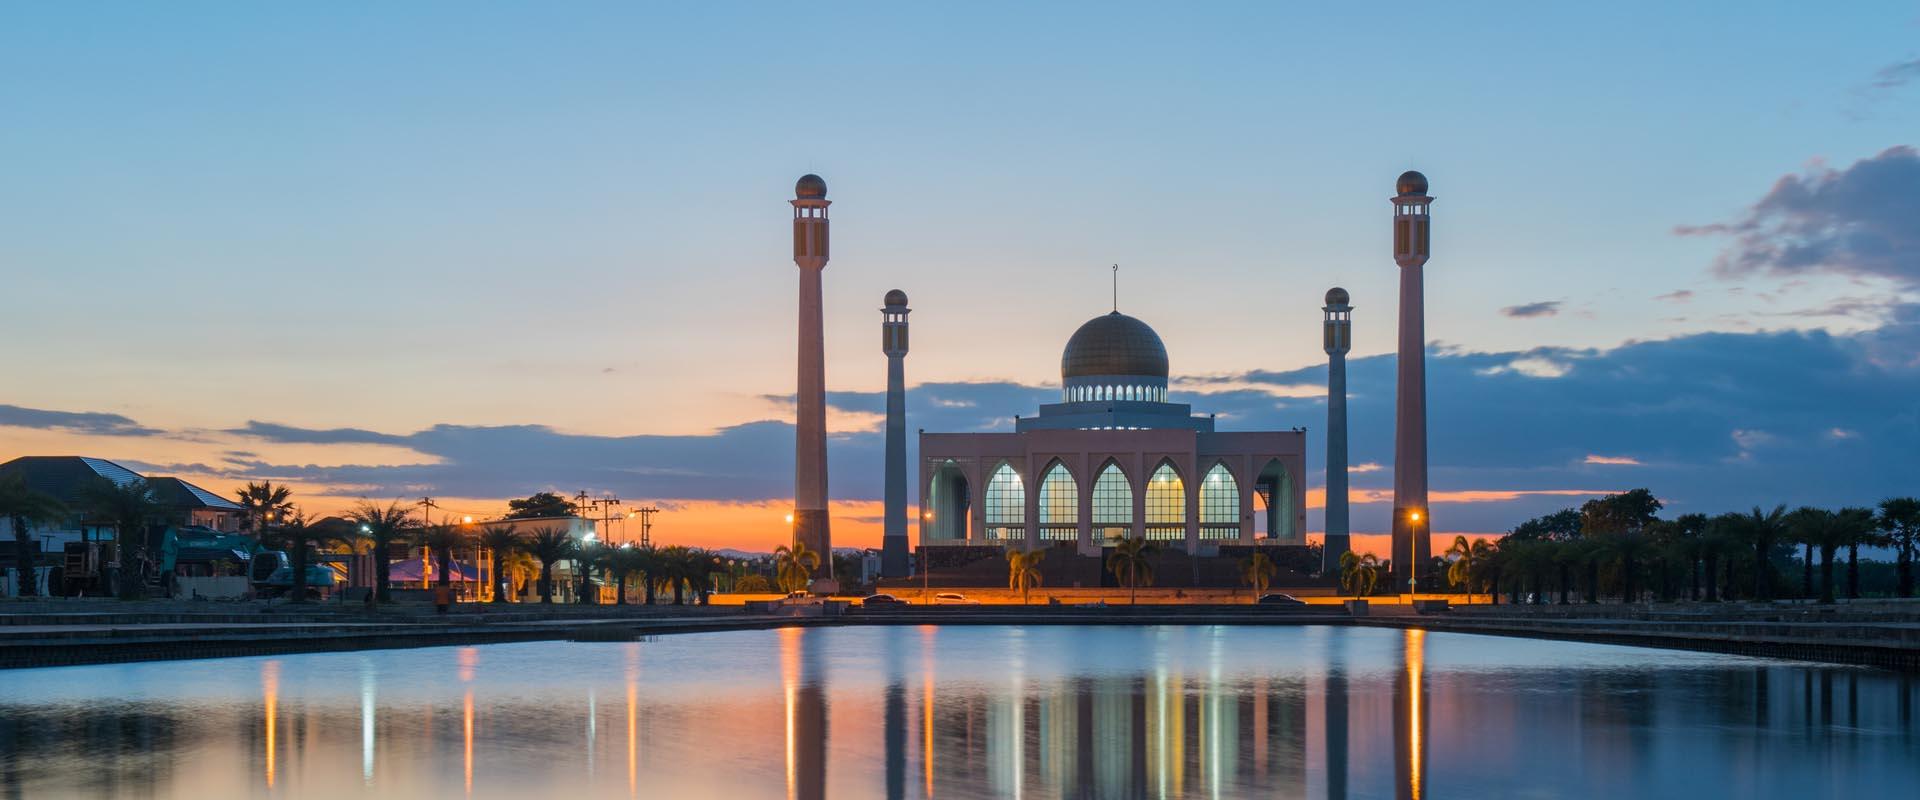 Hari Raya Aidil Adha 2021, 2022 and 2023 in Brunei ...